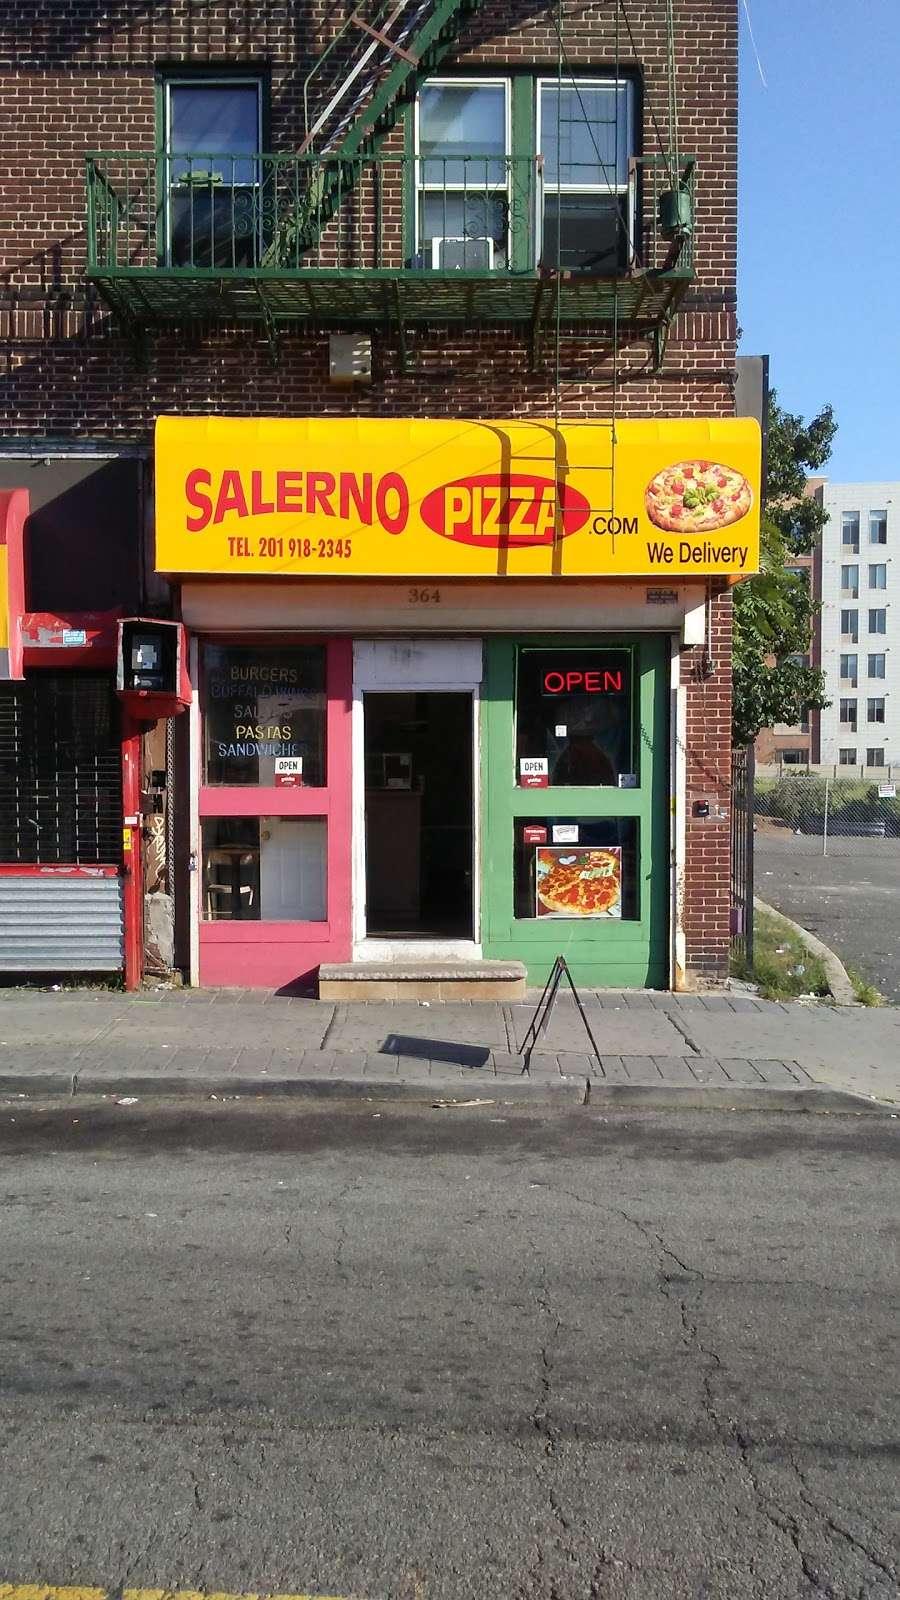 Salerno Pizza - meal delivery  | Photo 2 of 10 | Address: 364 Summit Ave, Jersey City, NJ 07306, USA | Phone: (201) 918-2345